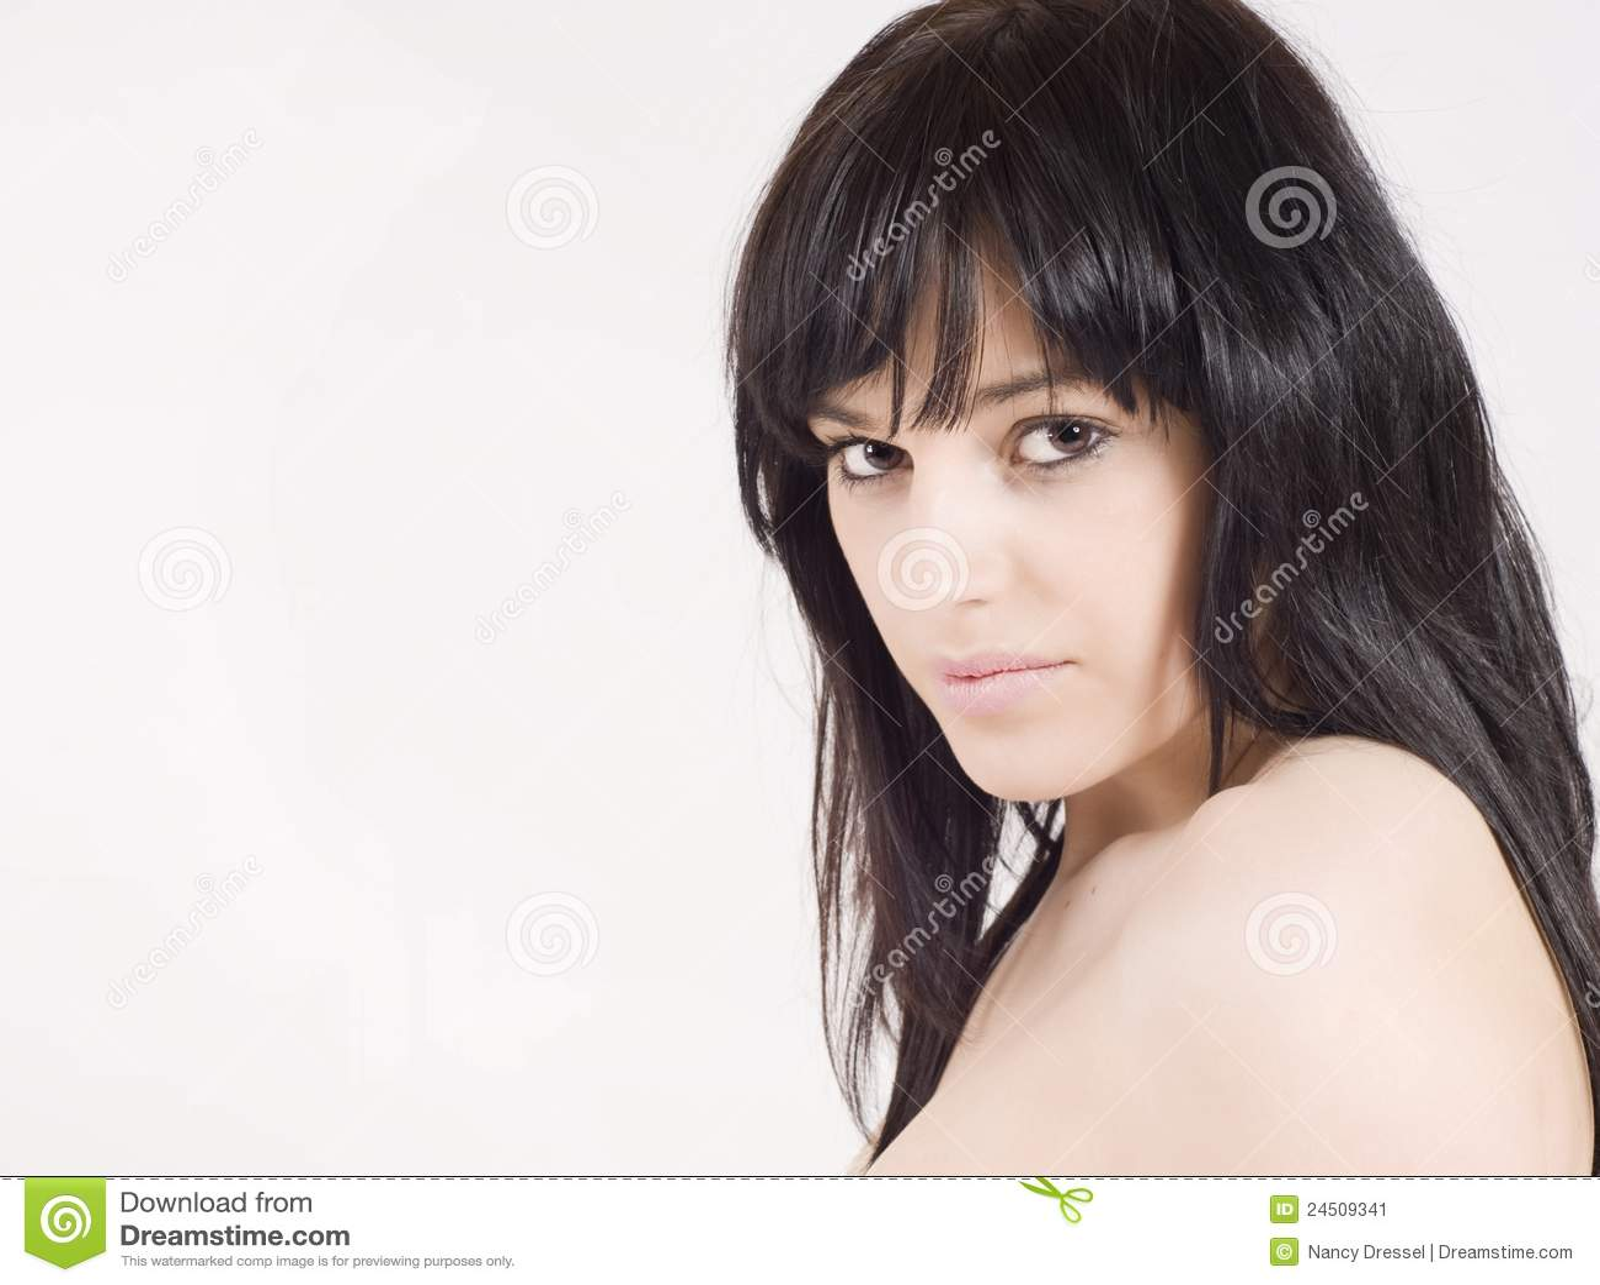 Beautiful, sensual young woman looking